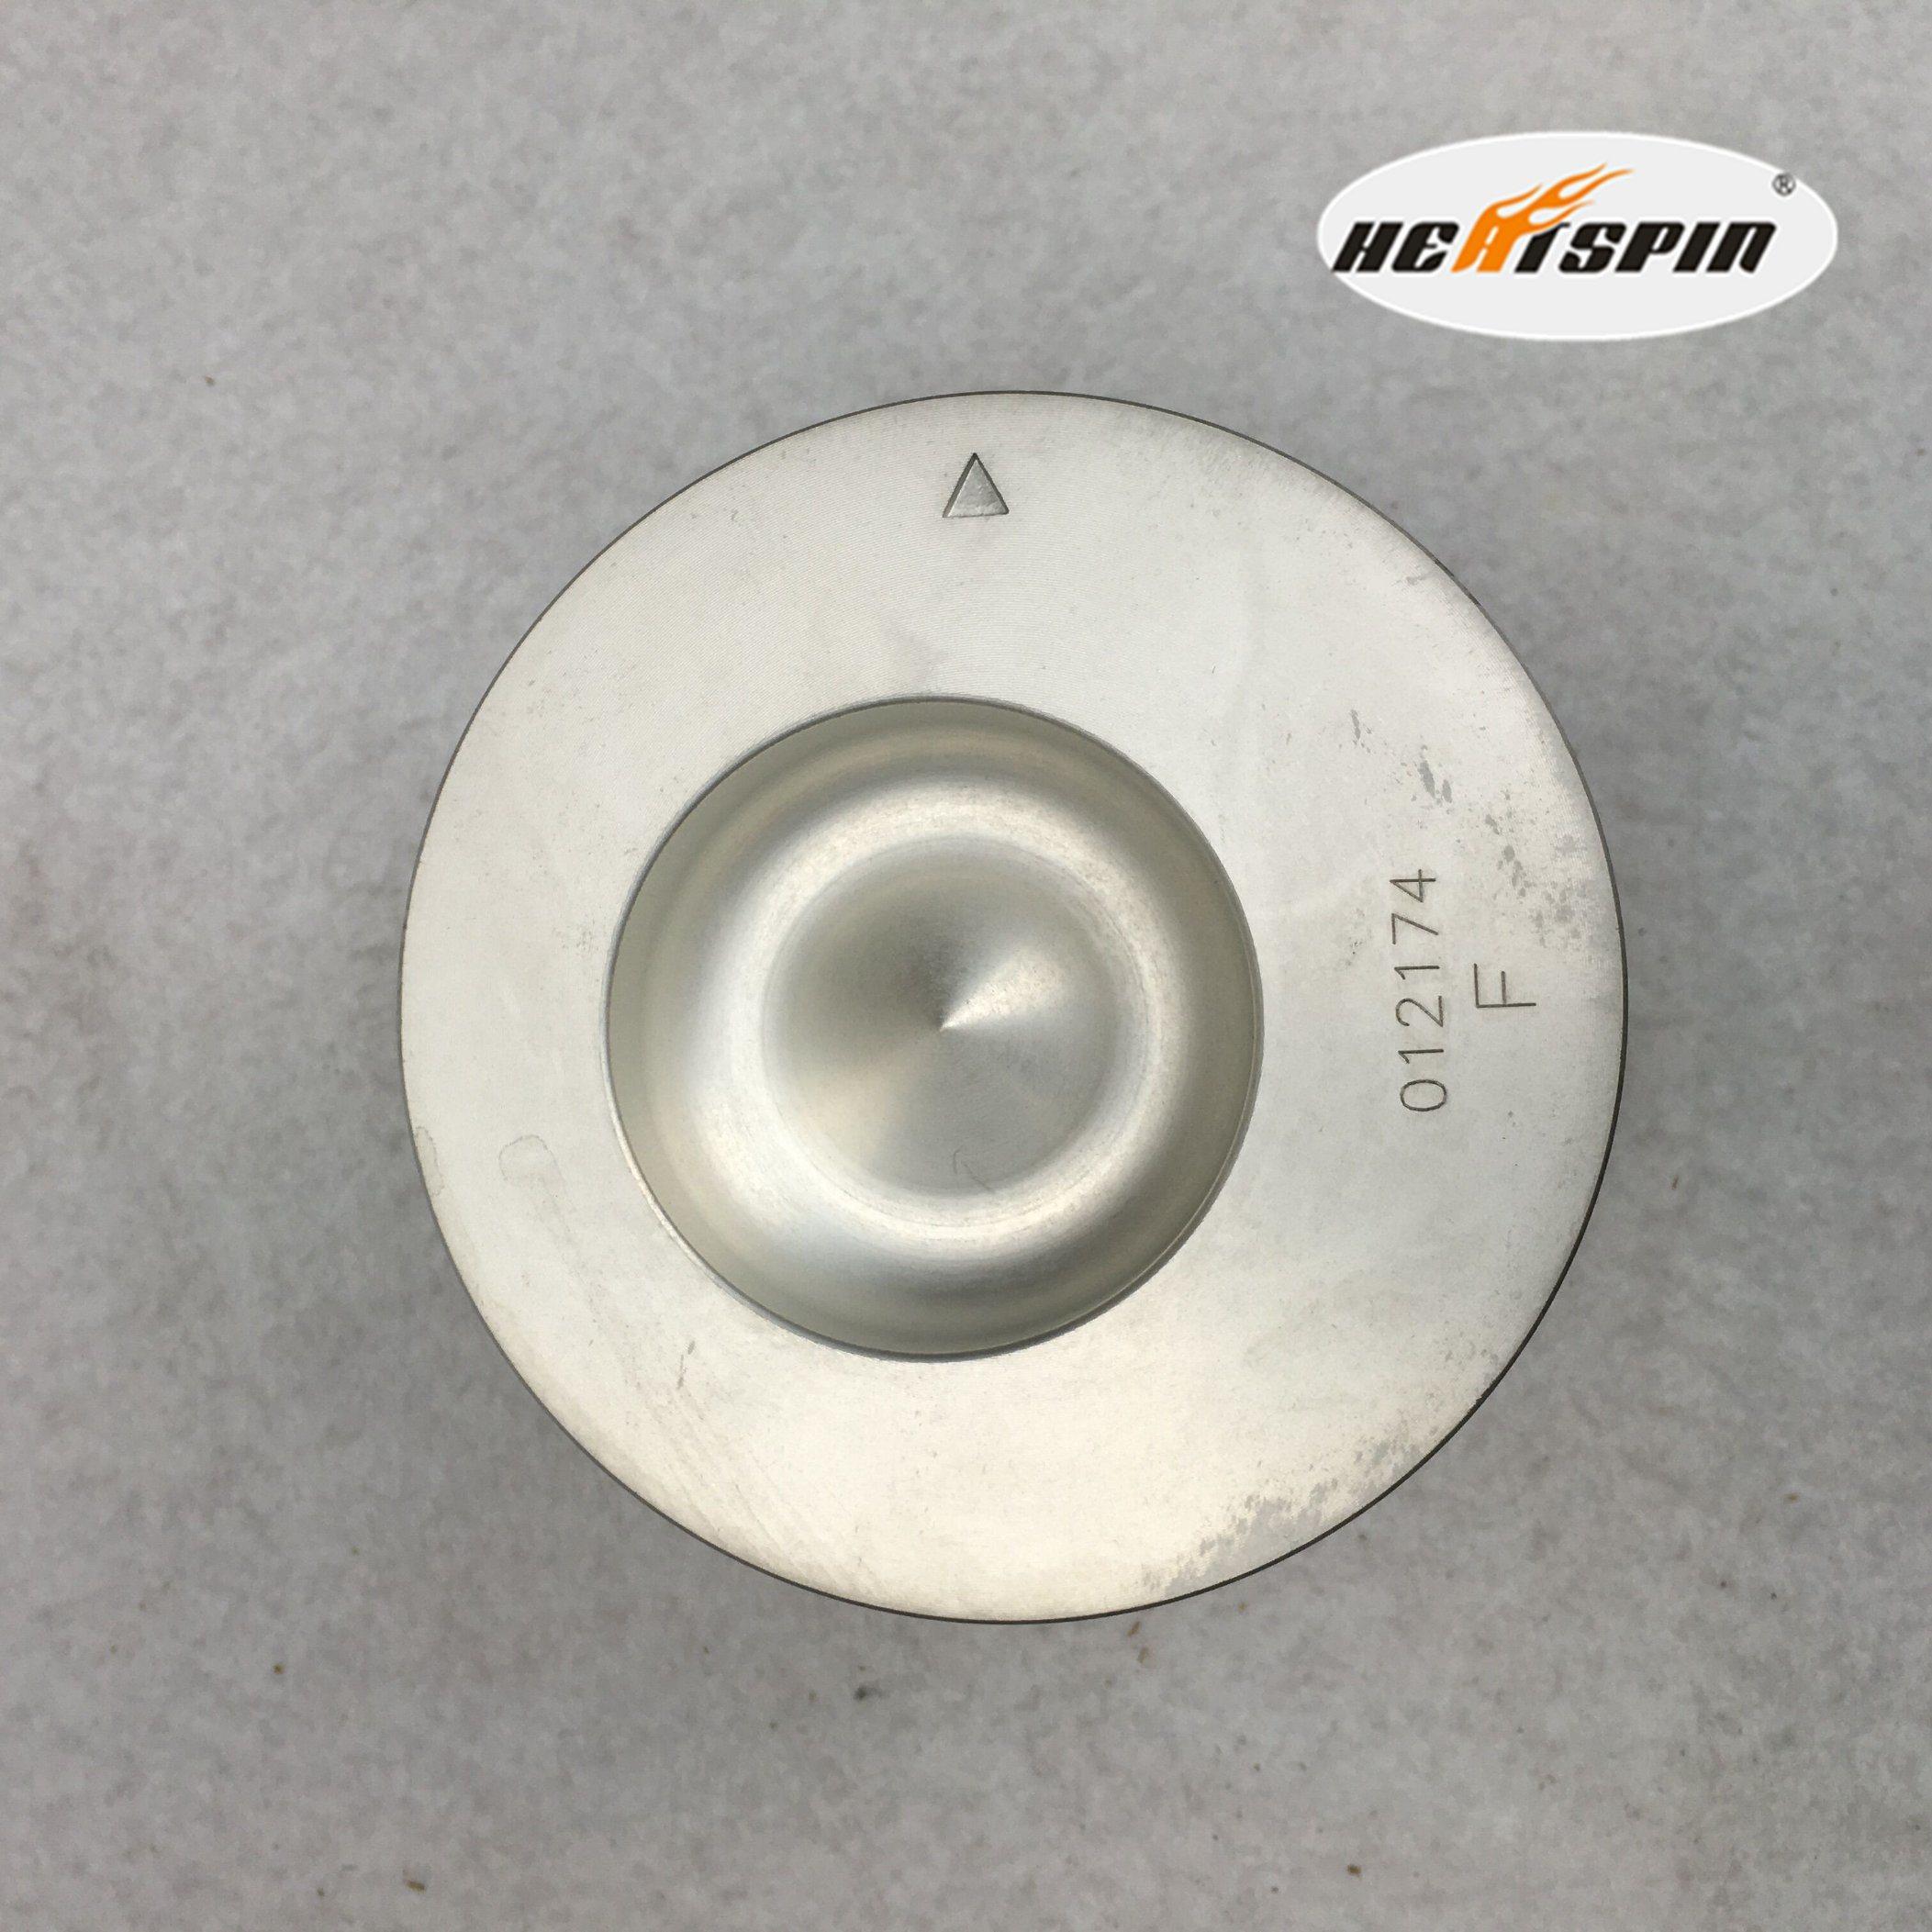 Engine Piston 4D32 for Mitsubishi Spare Part Diameter 104mm